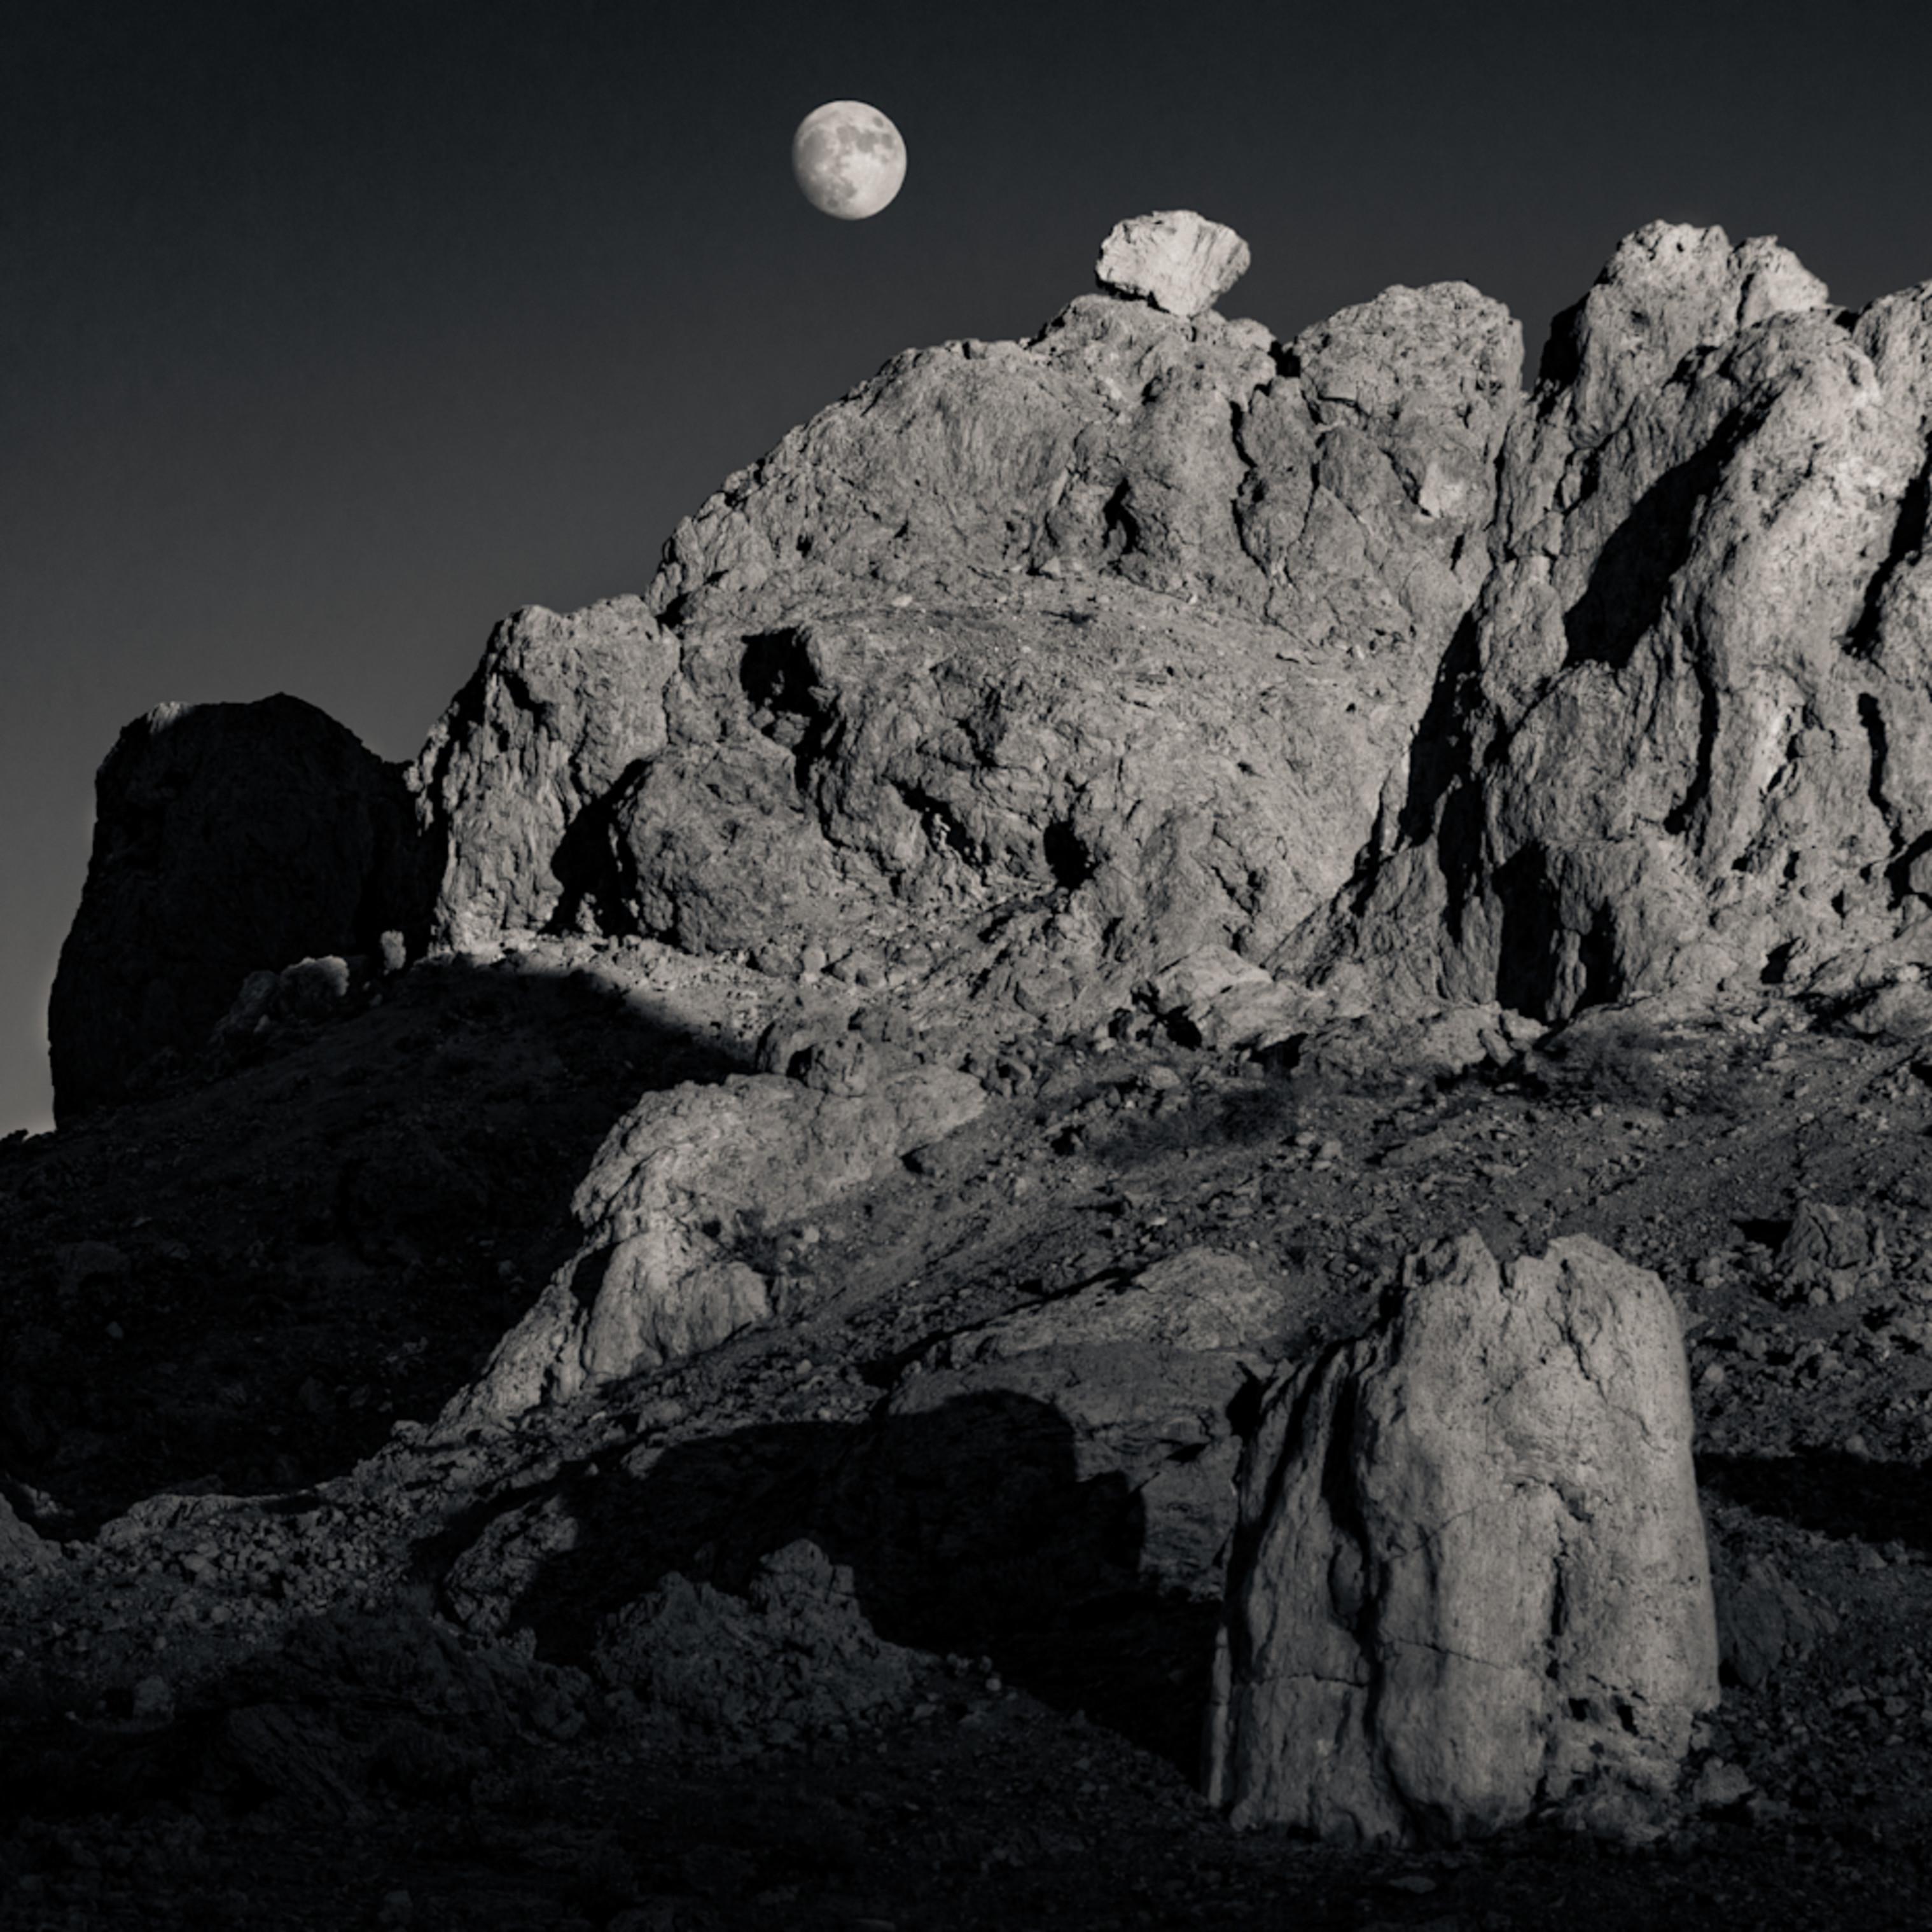 Moonrise trona pinnacles dkr6ij